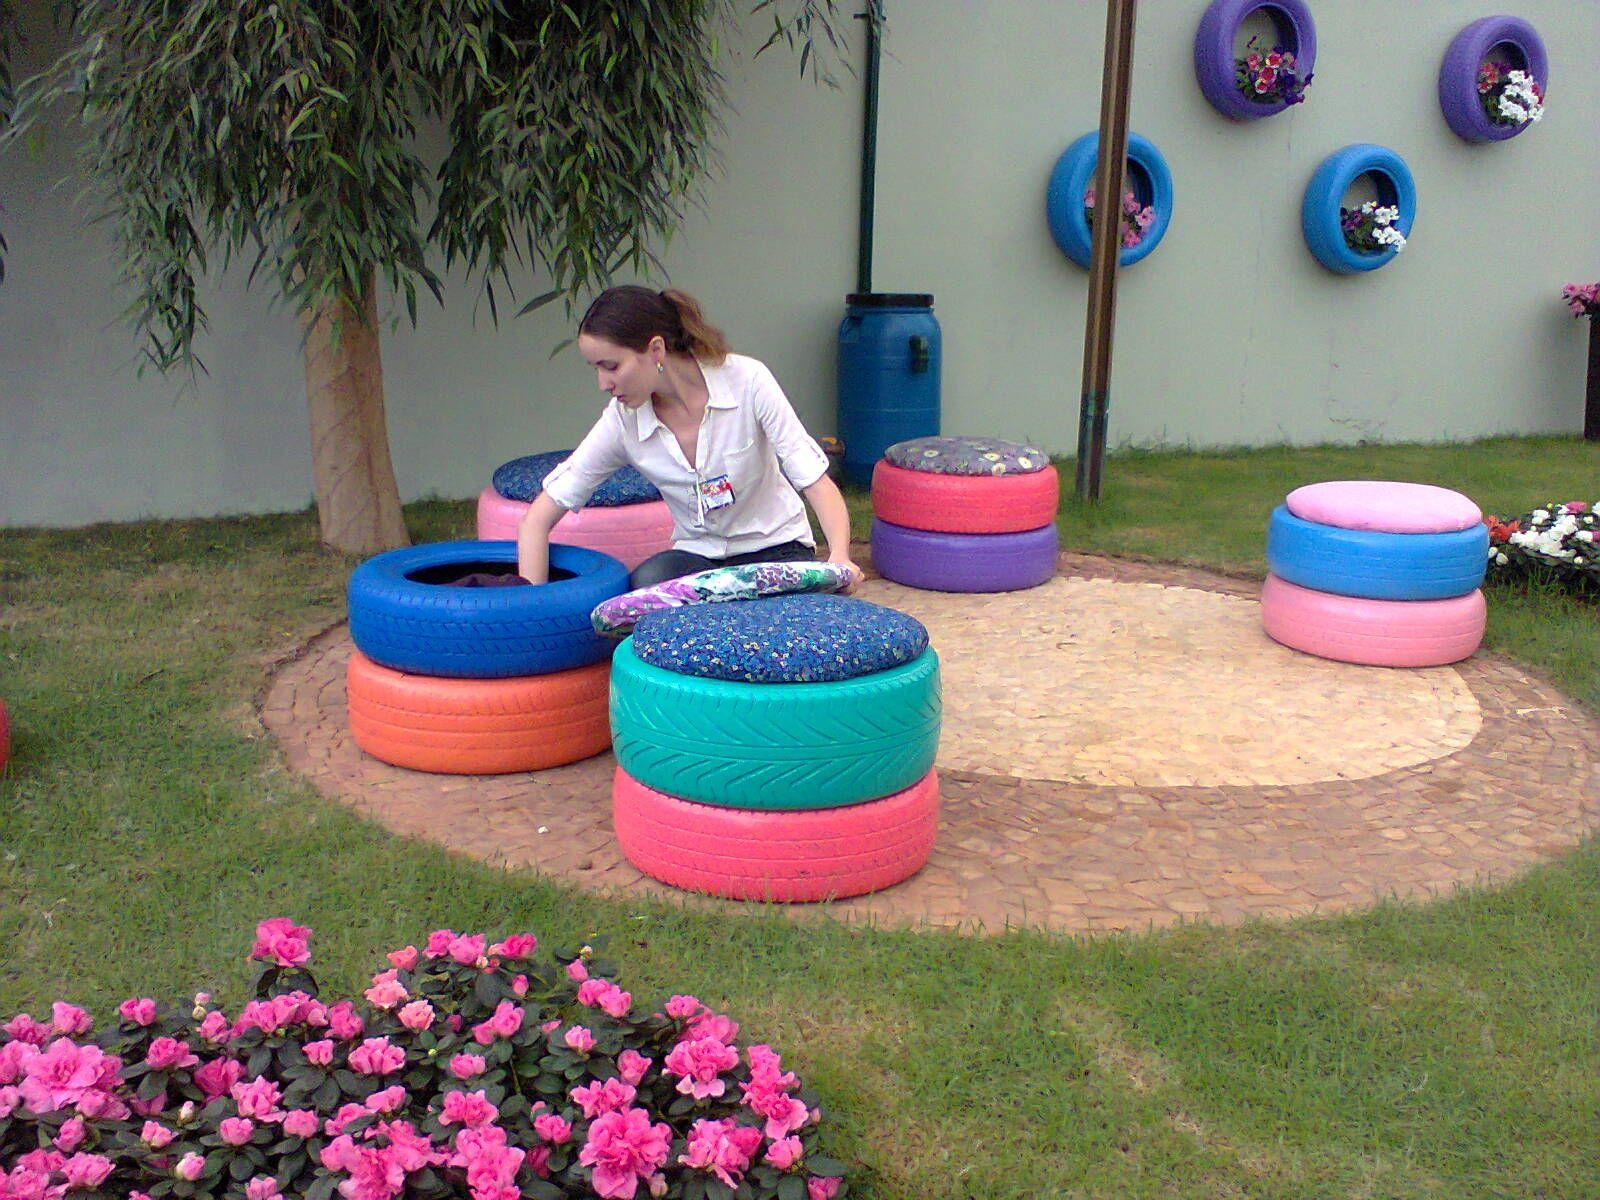 Garden decor with tyres  EL RINCON uCITOu  DECORA RECICLANDO   Tired Gardens and Recycle